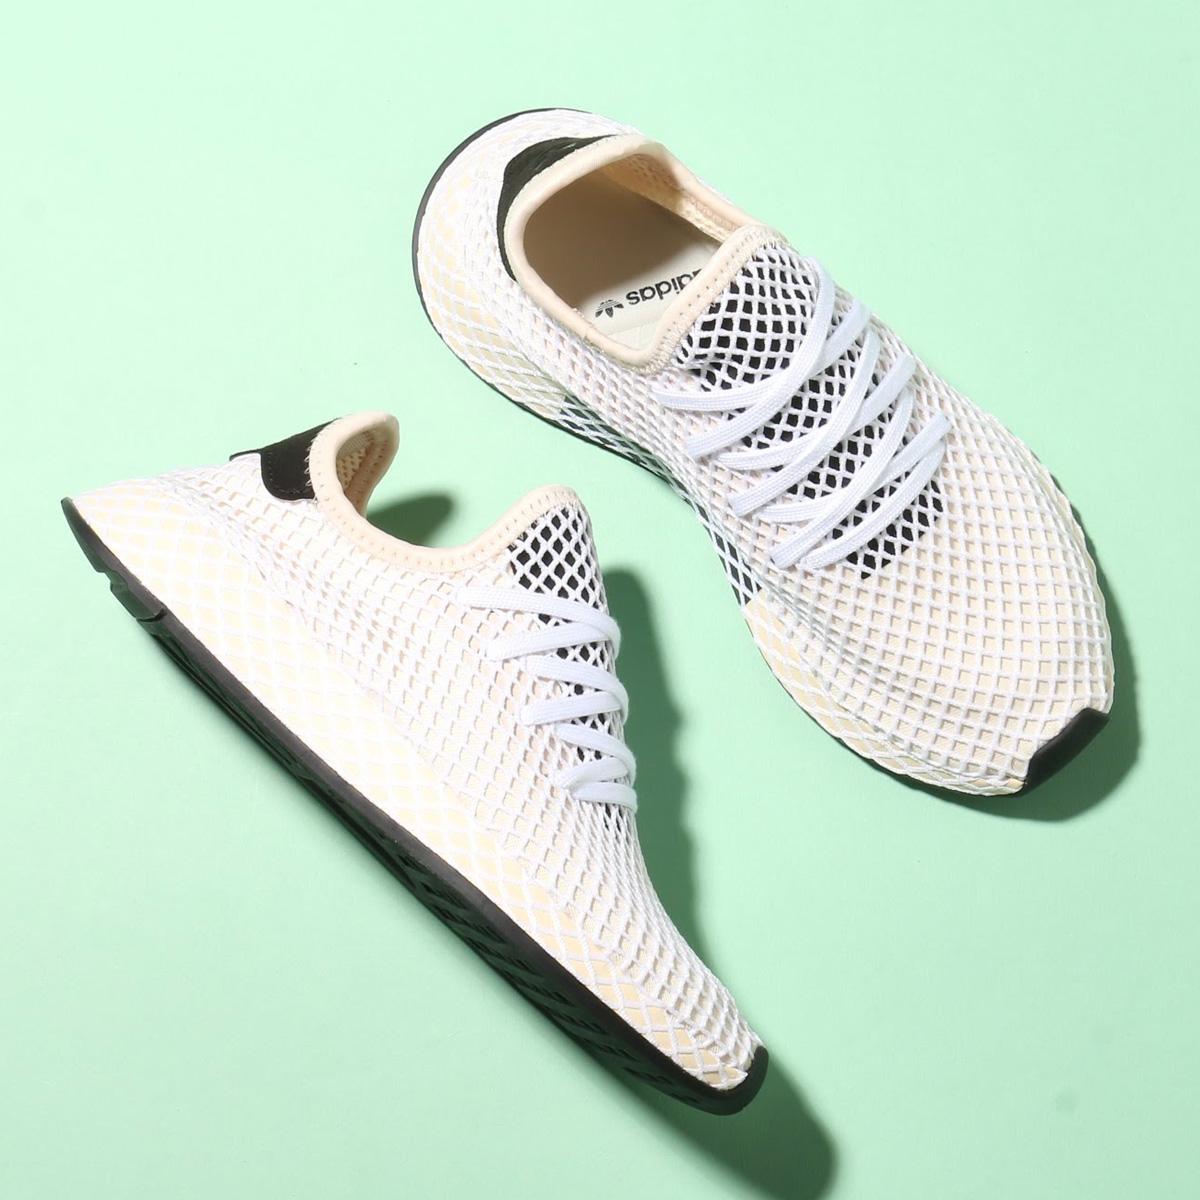 adidas Originals DEERUPT RUNNER W (アディダス オリジナルス ディーラプト ランナー W) Linen/Linen/Ecru Tint【レディース スニーカー】18SS-S